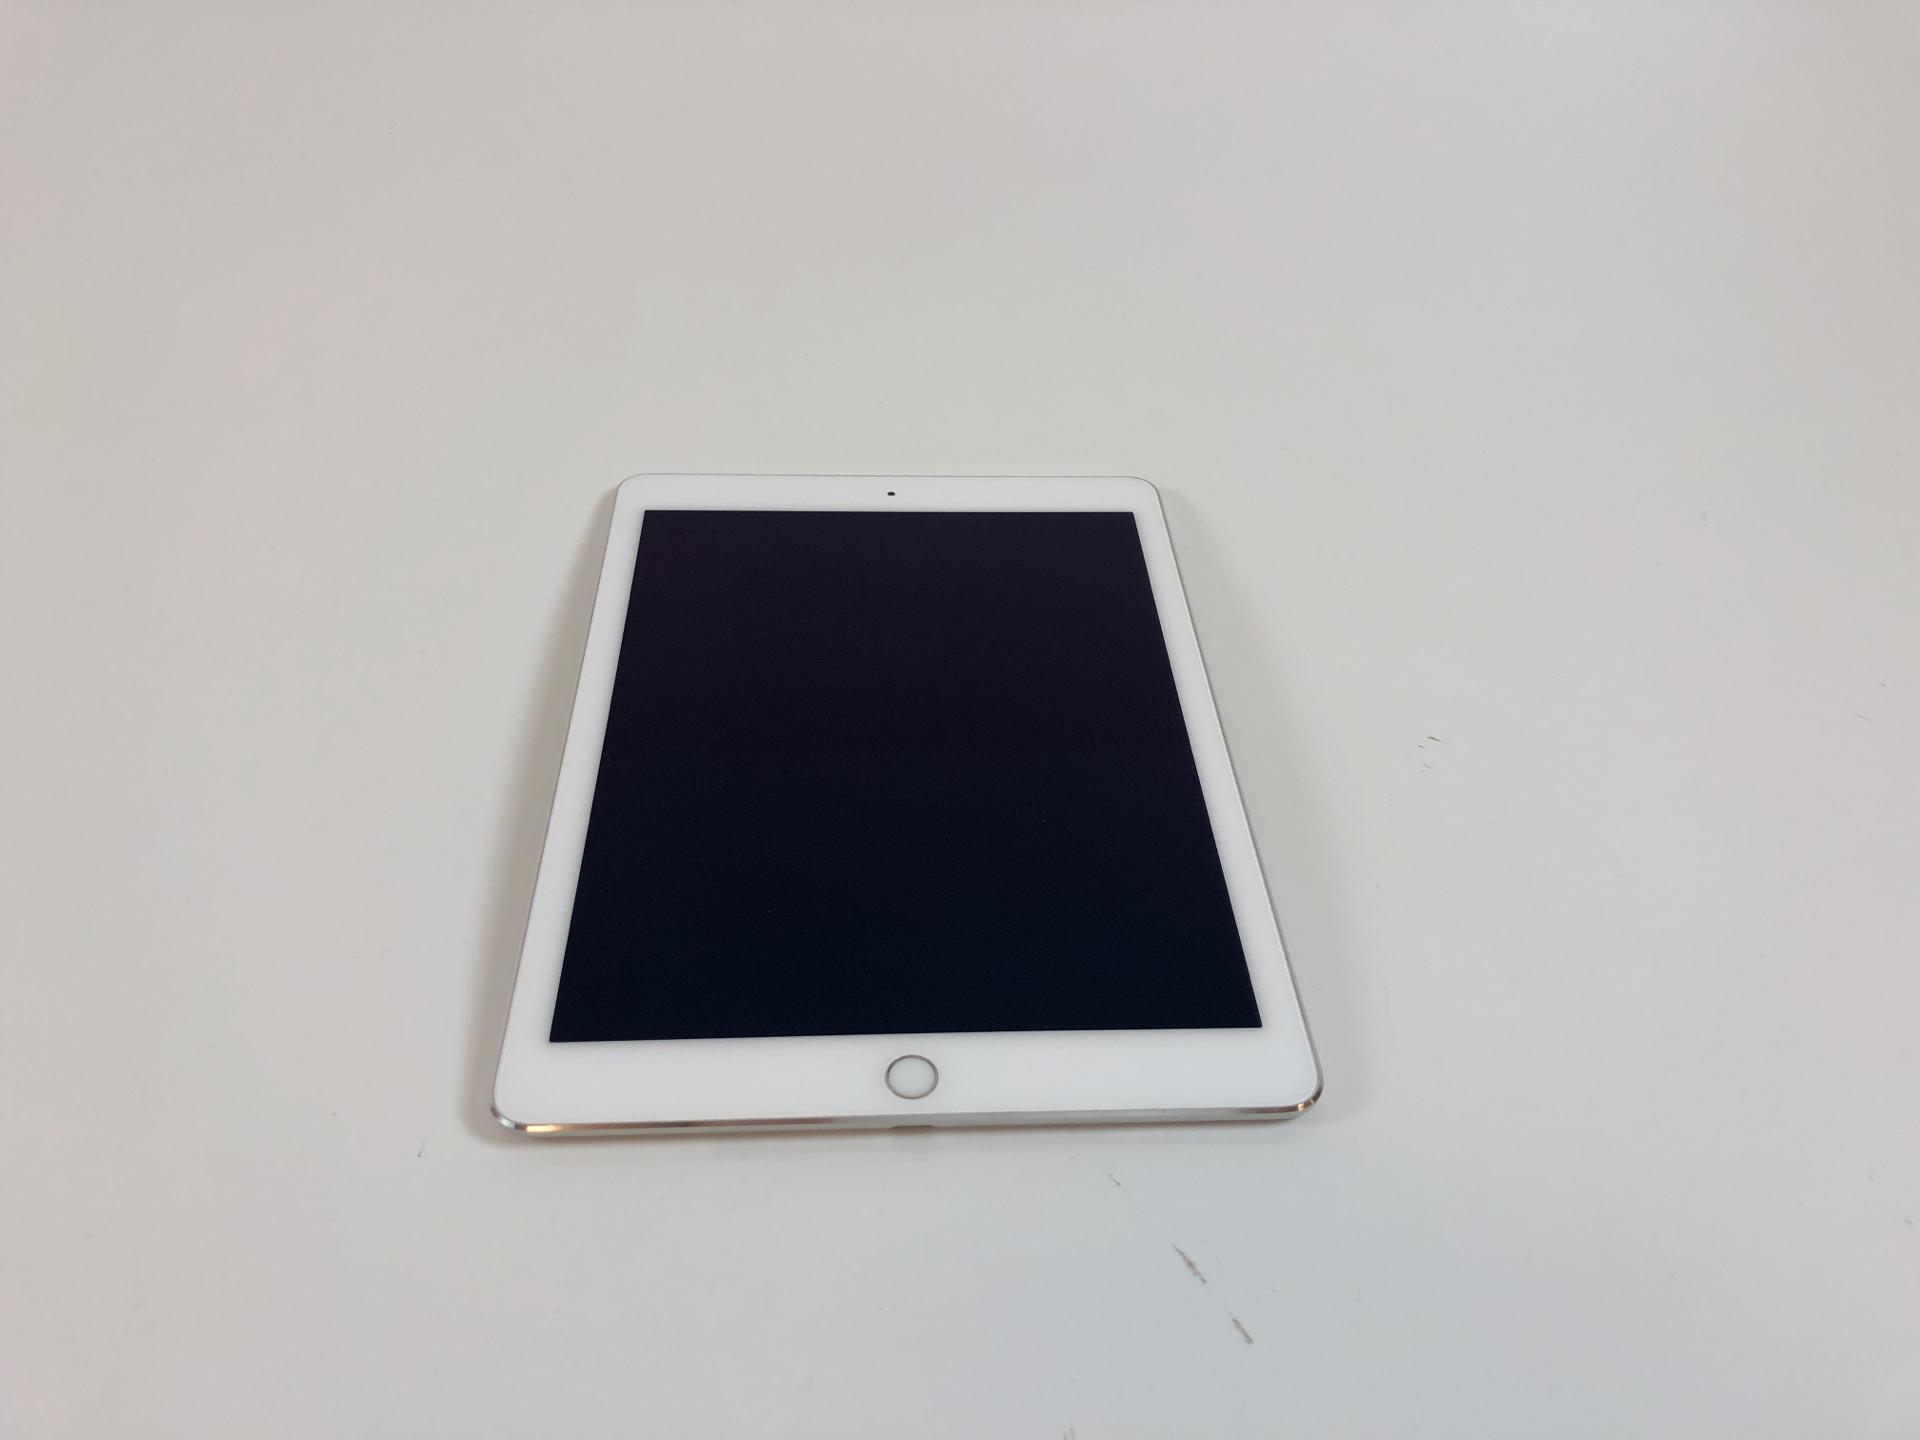 iPad Air 2 Wi-Fi 16GB, 16GB, Silver, imagen 1